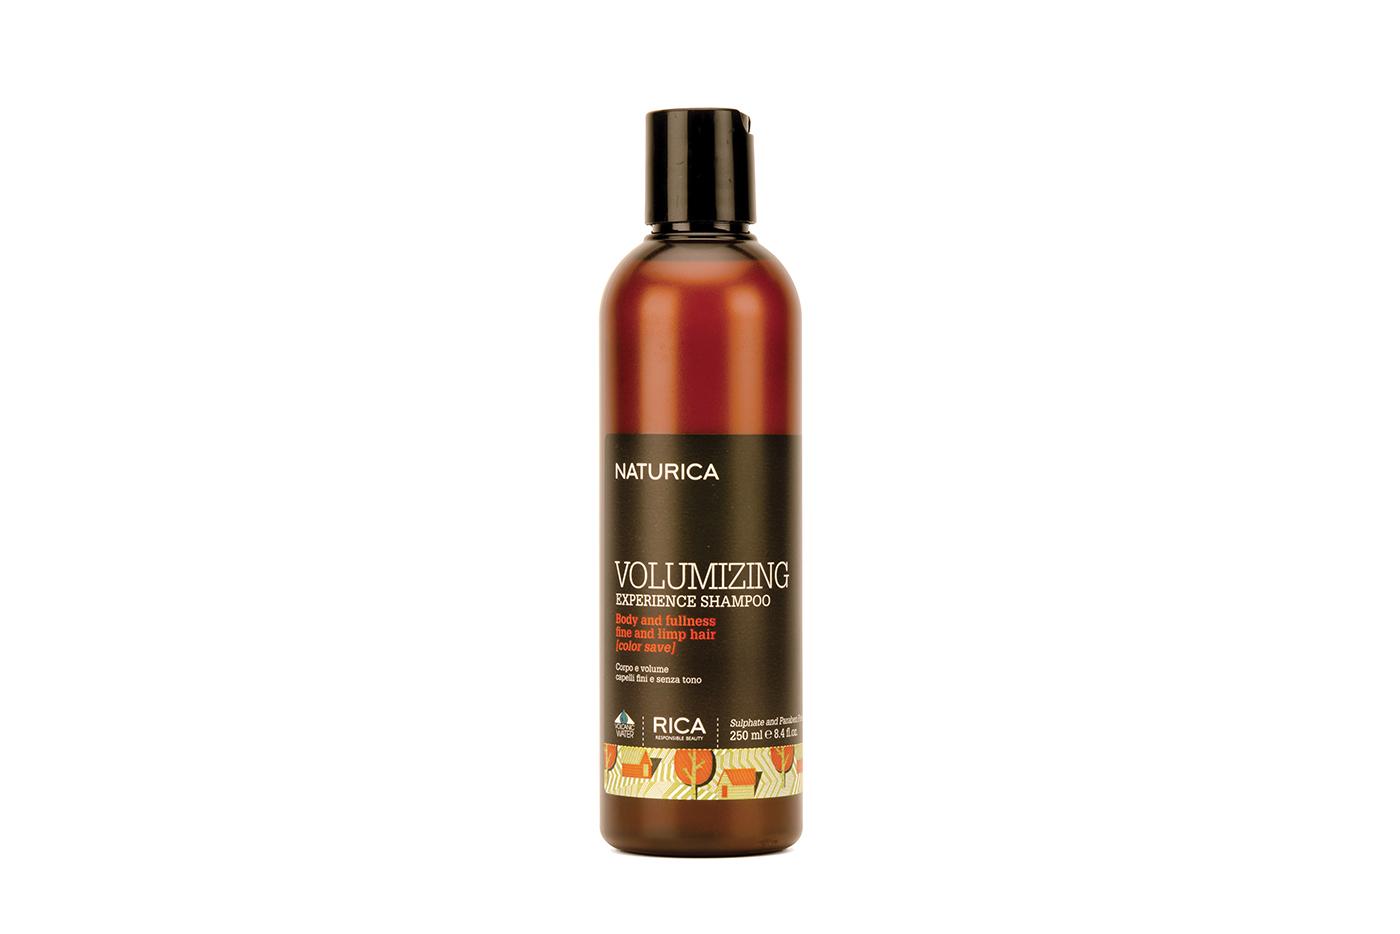 Naturica Volumizing Experience Shampoo